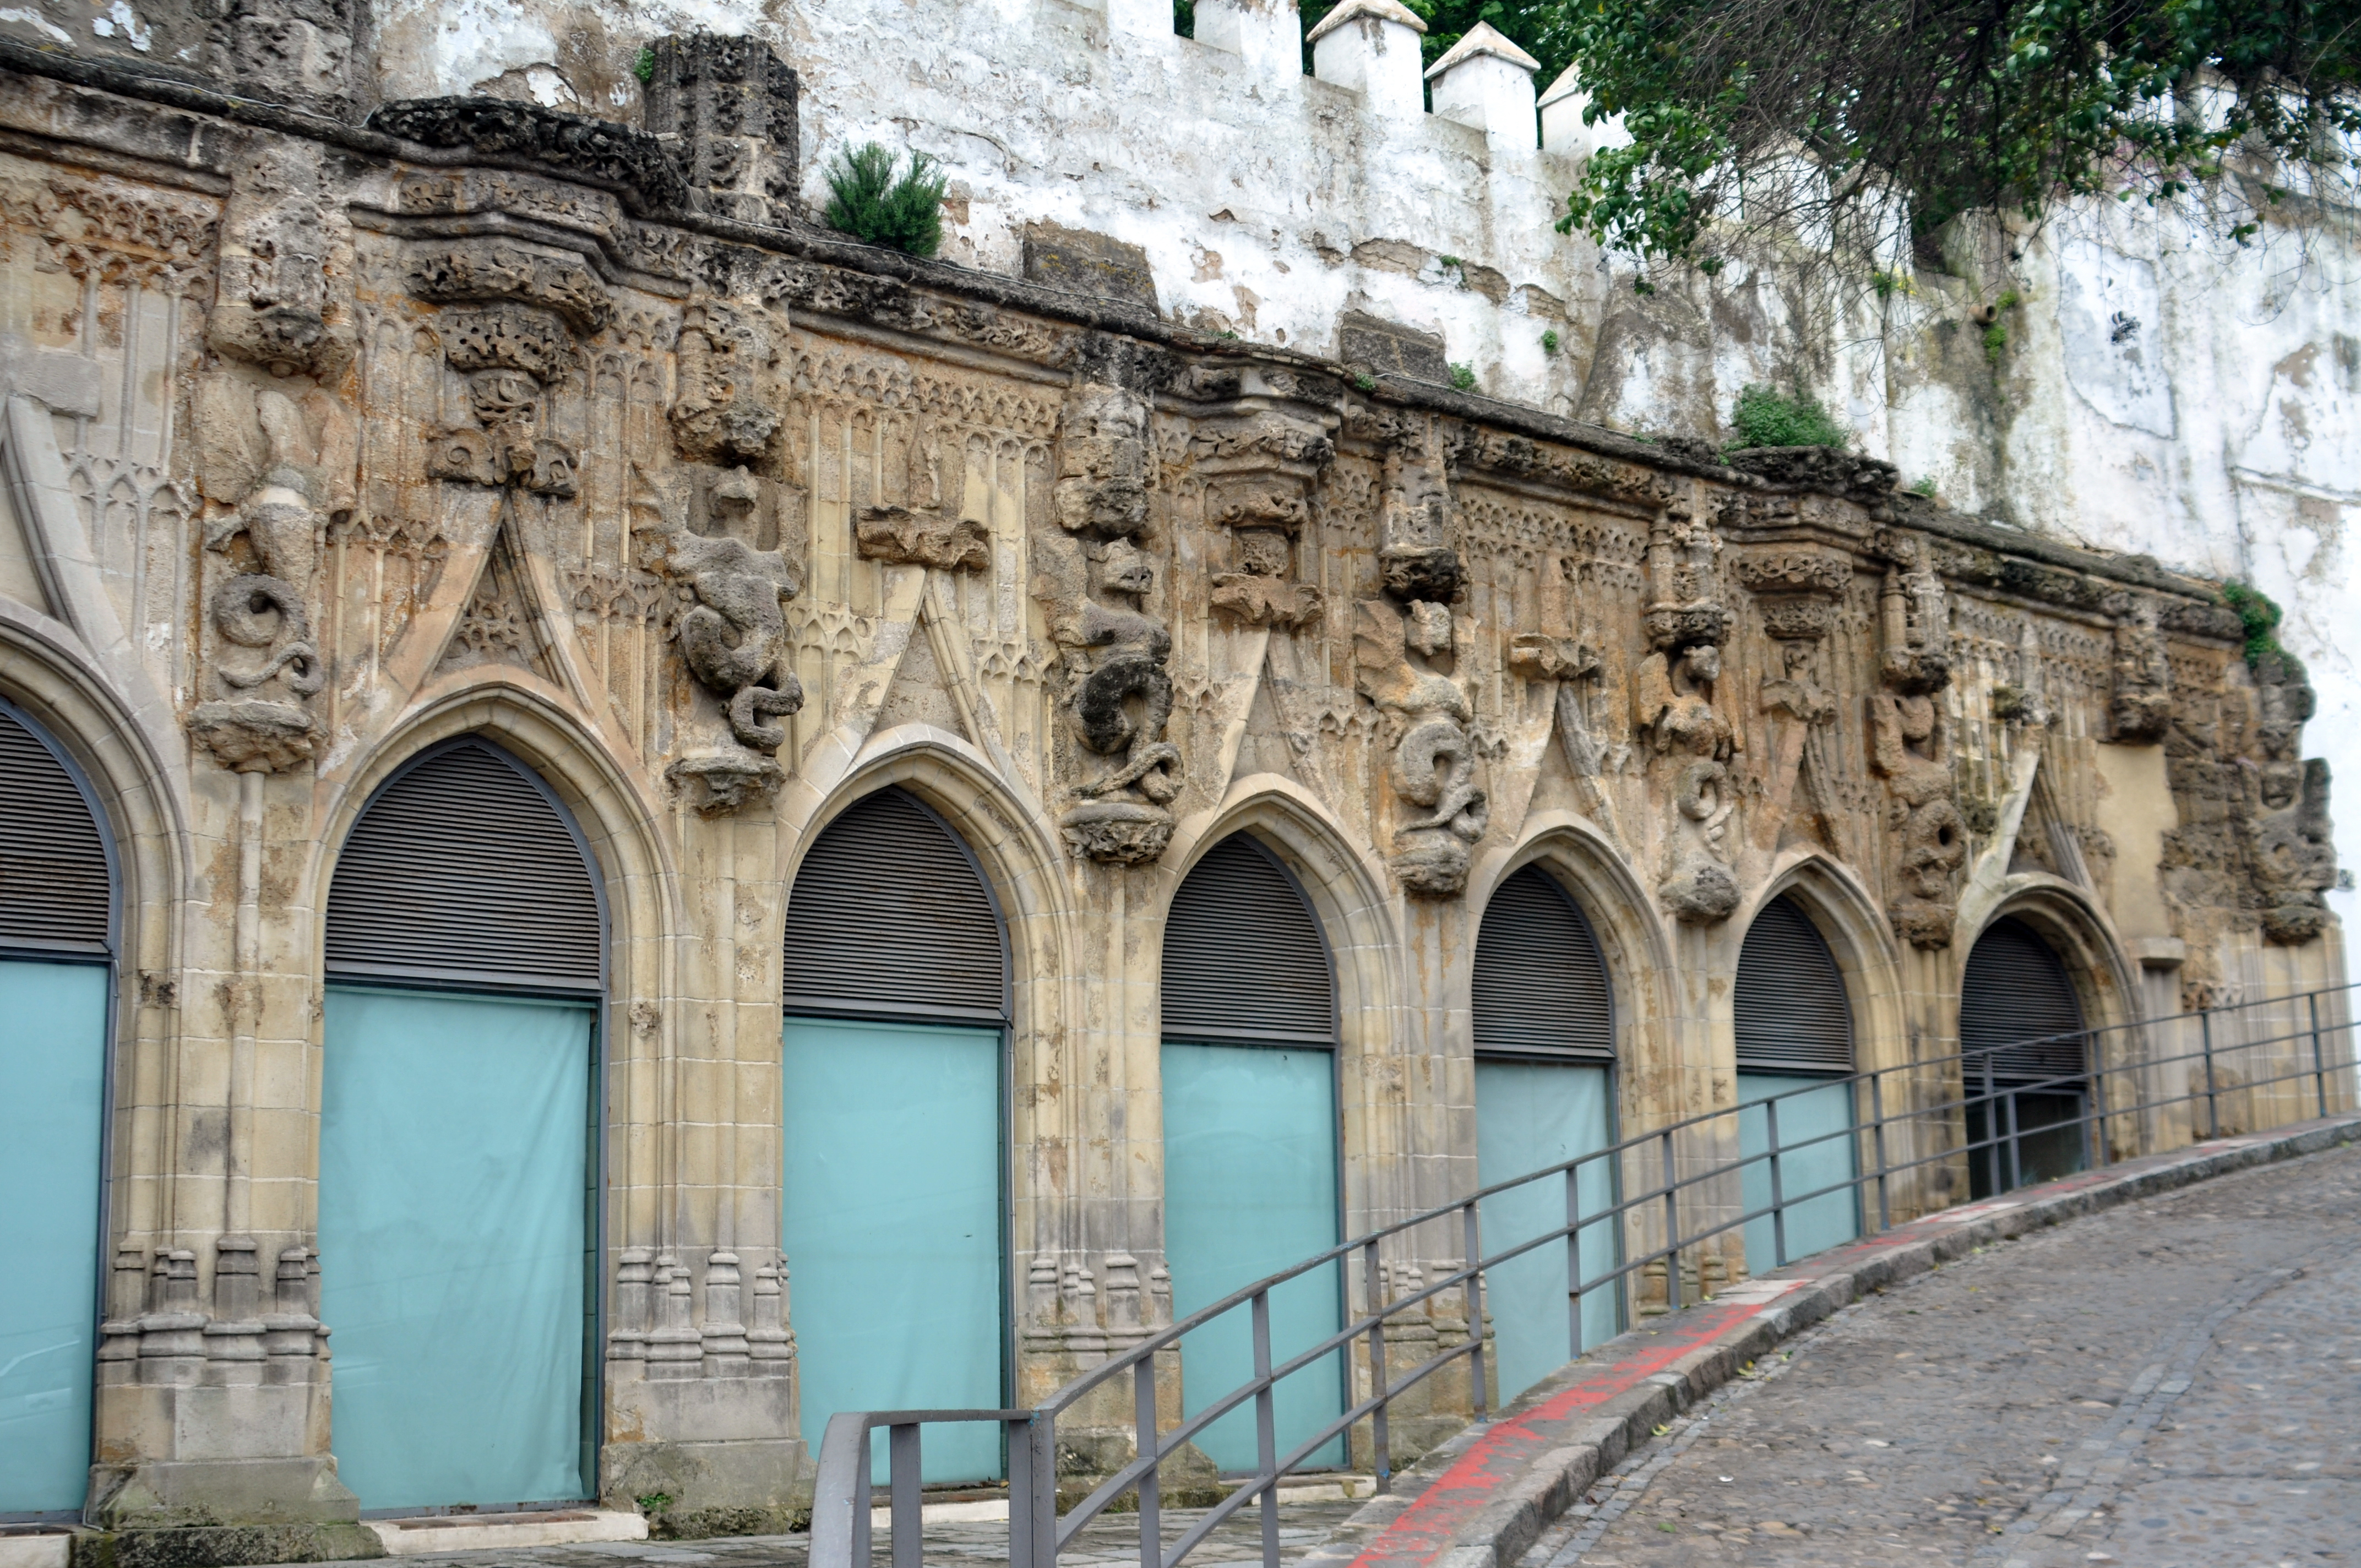 Sanlucar de Barrameda Spain  city photo : Covachas de Sanlúcar de Barrameda Wikimedia Commons